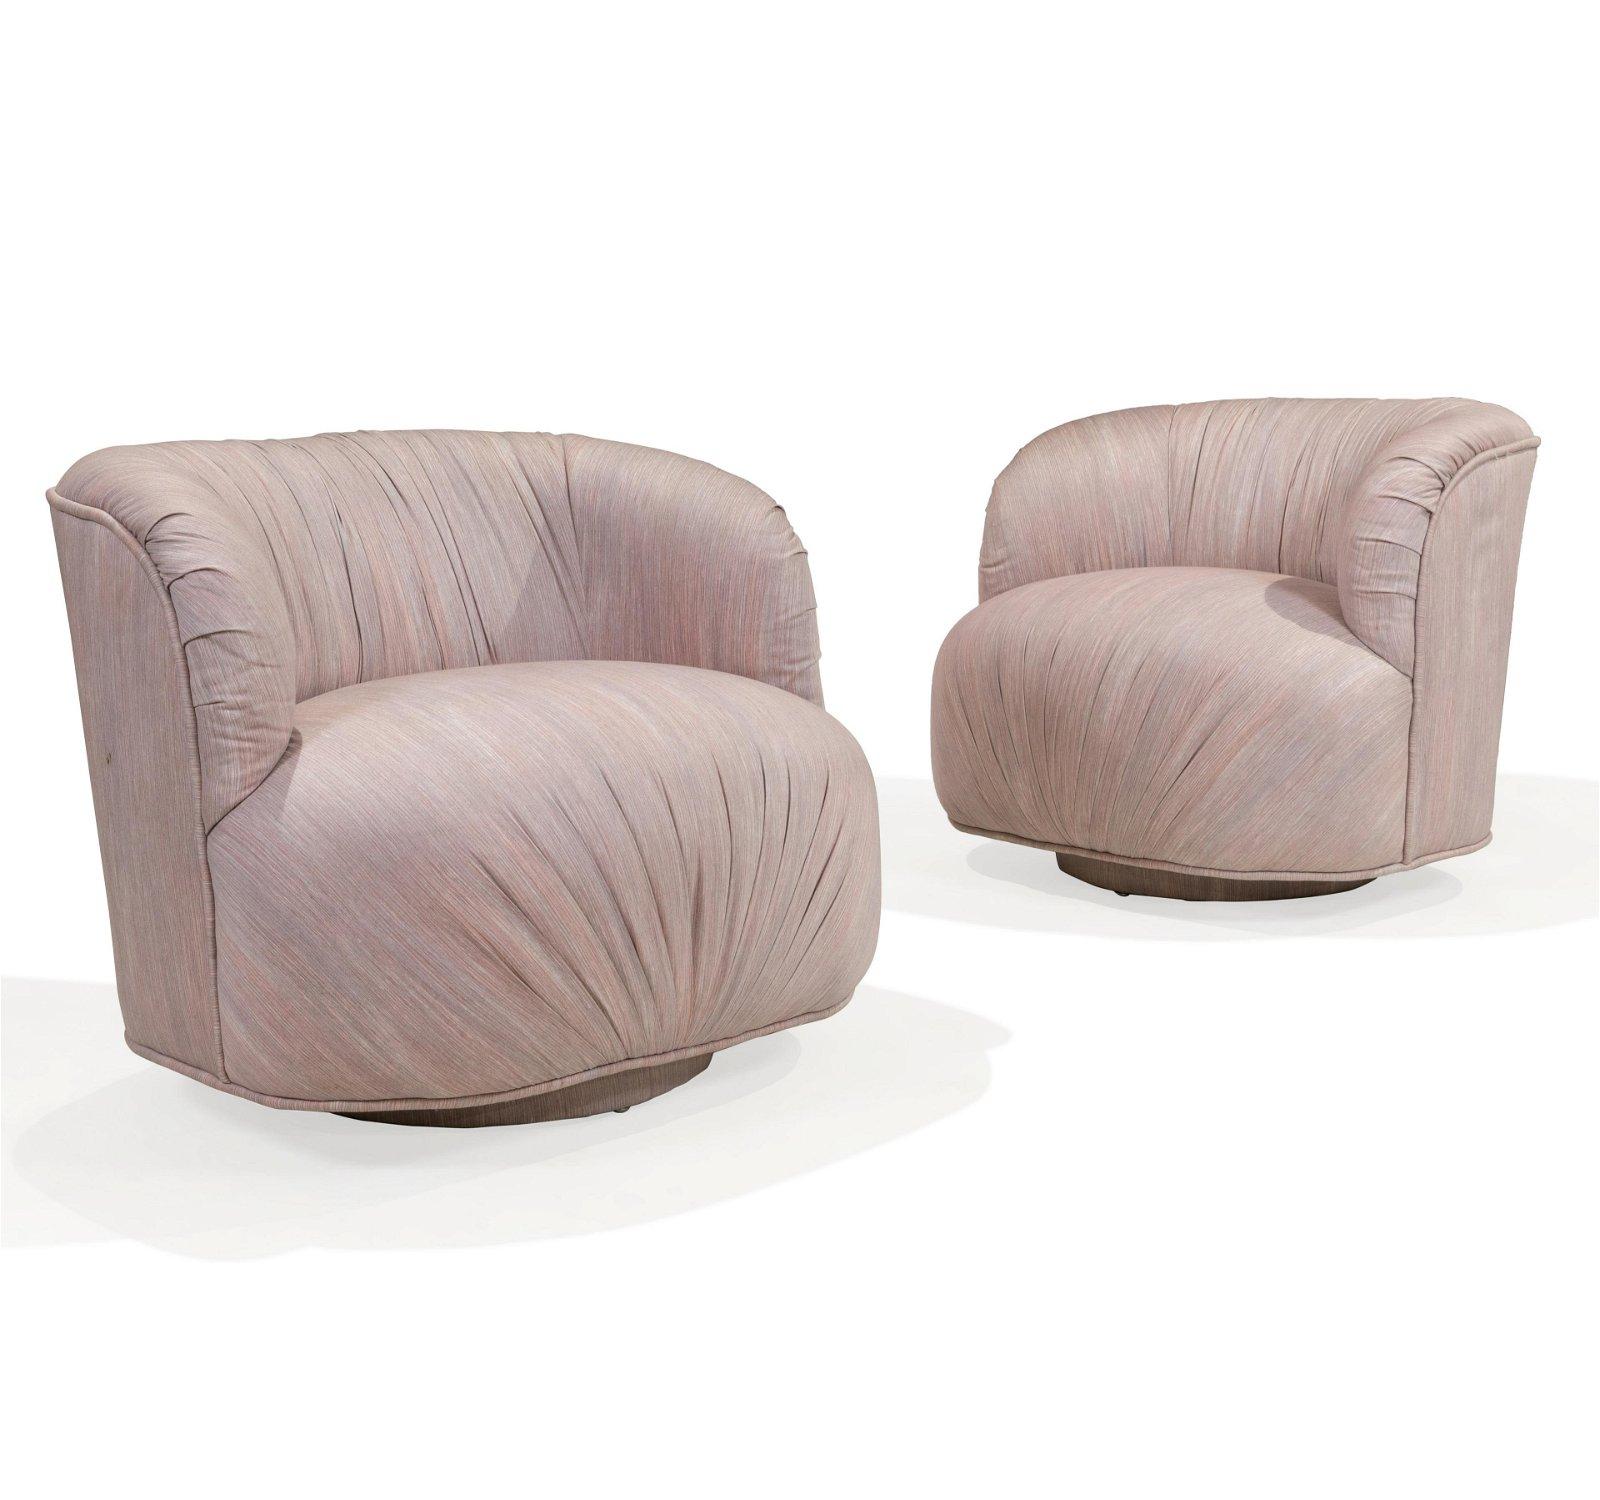 Vladimir Kagan - Weiman - Swivel Chairs